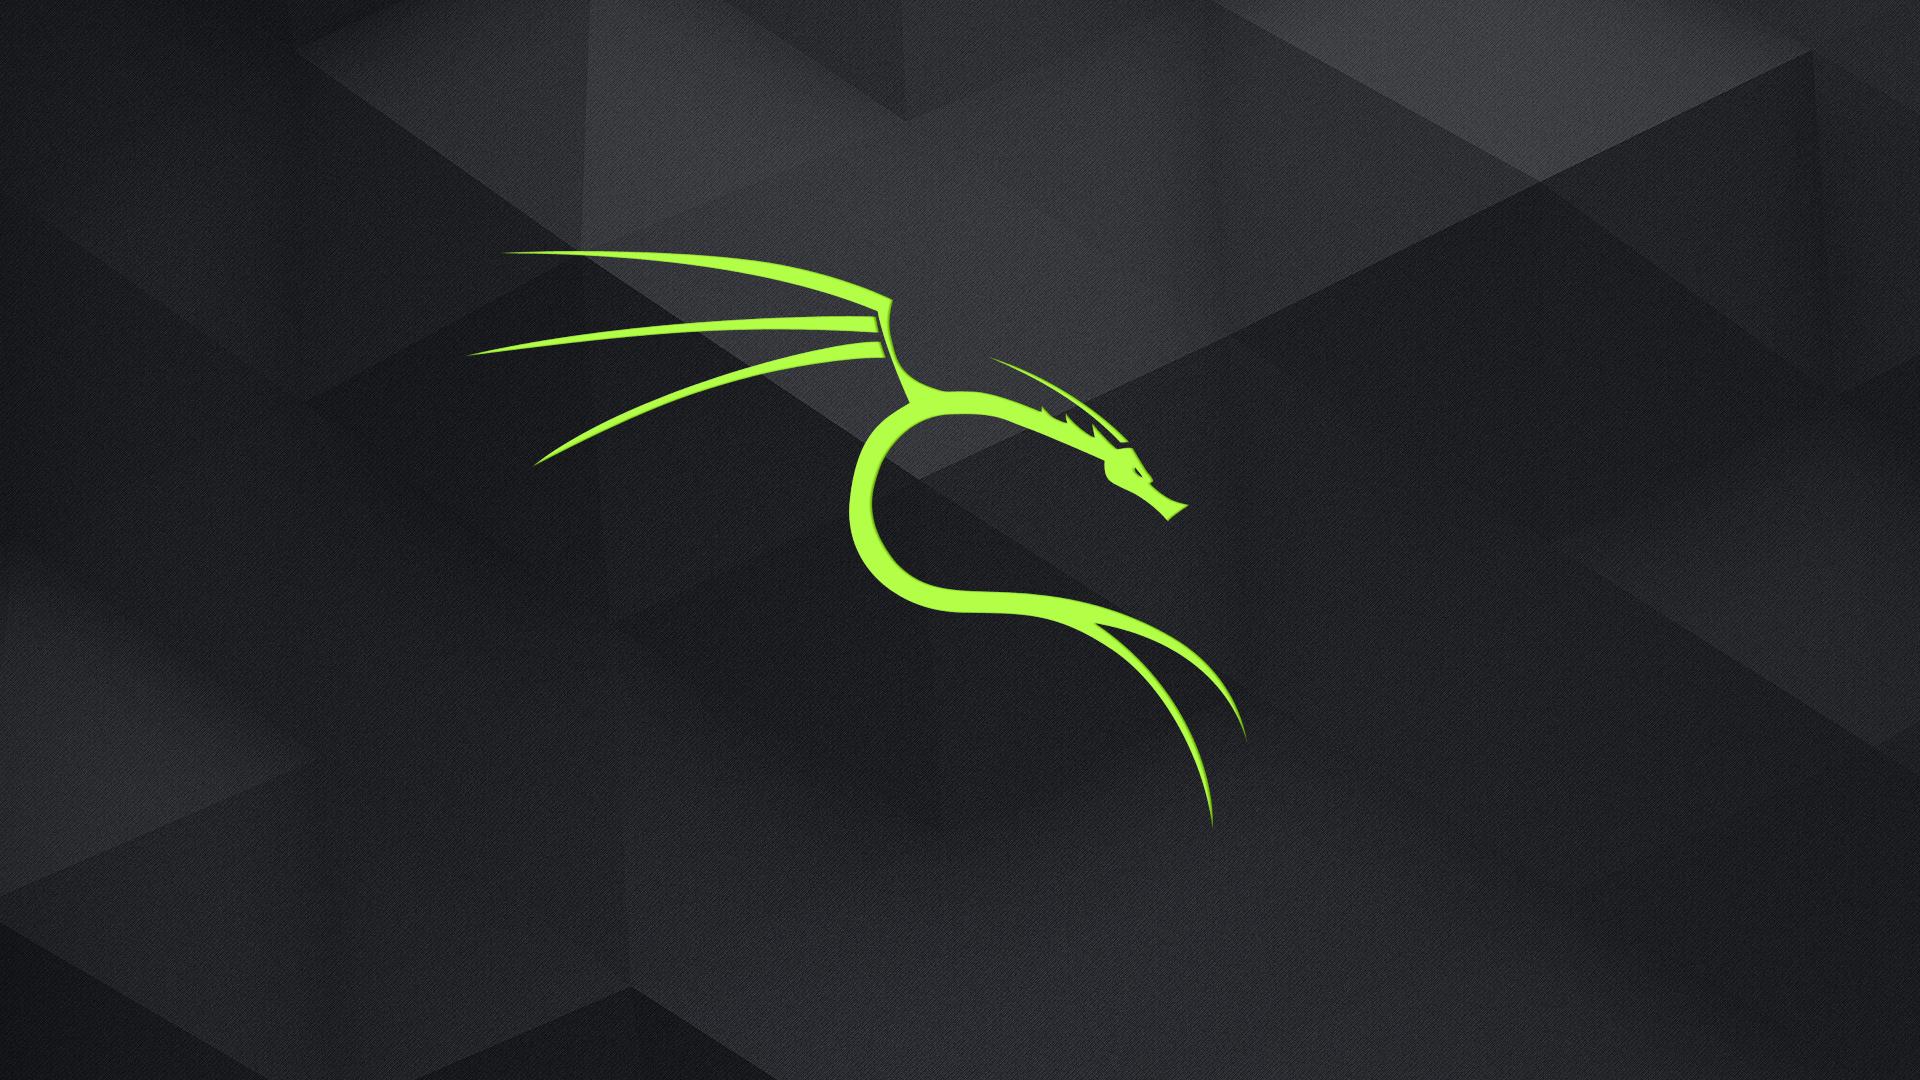 Gnu Linux Wallpaper